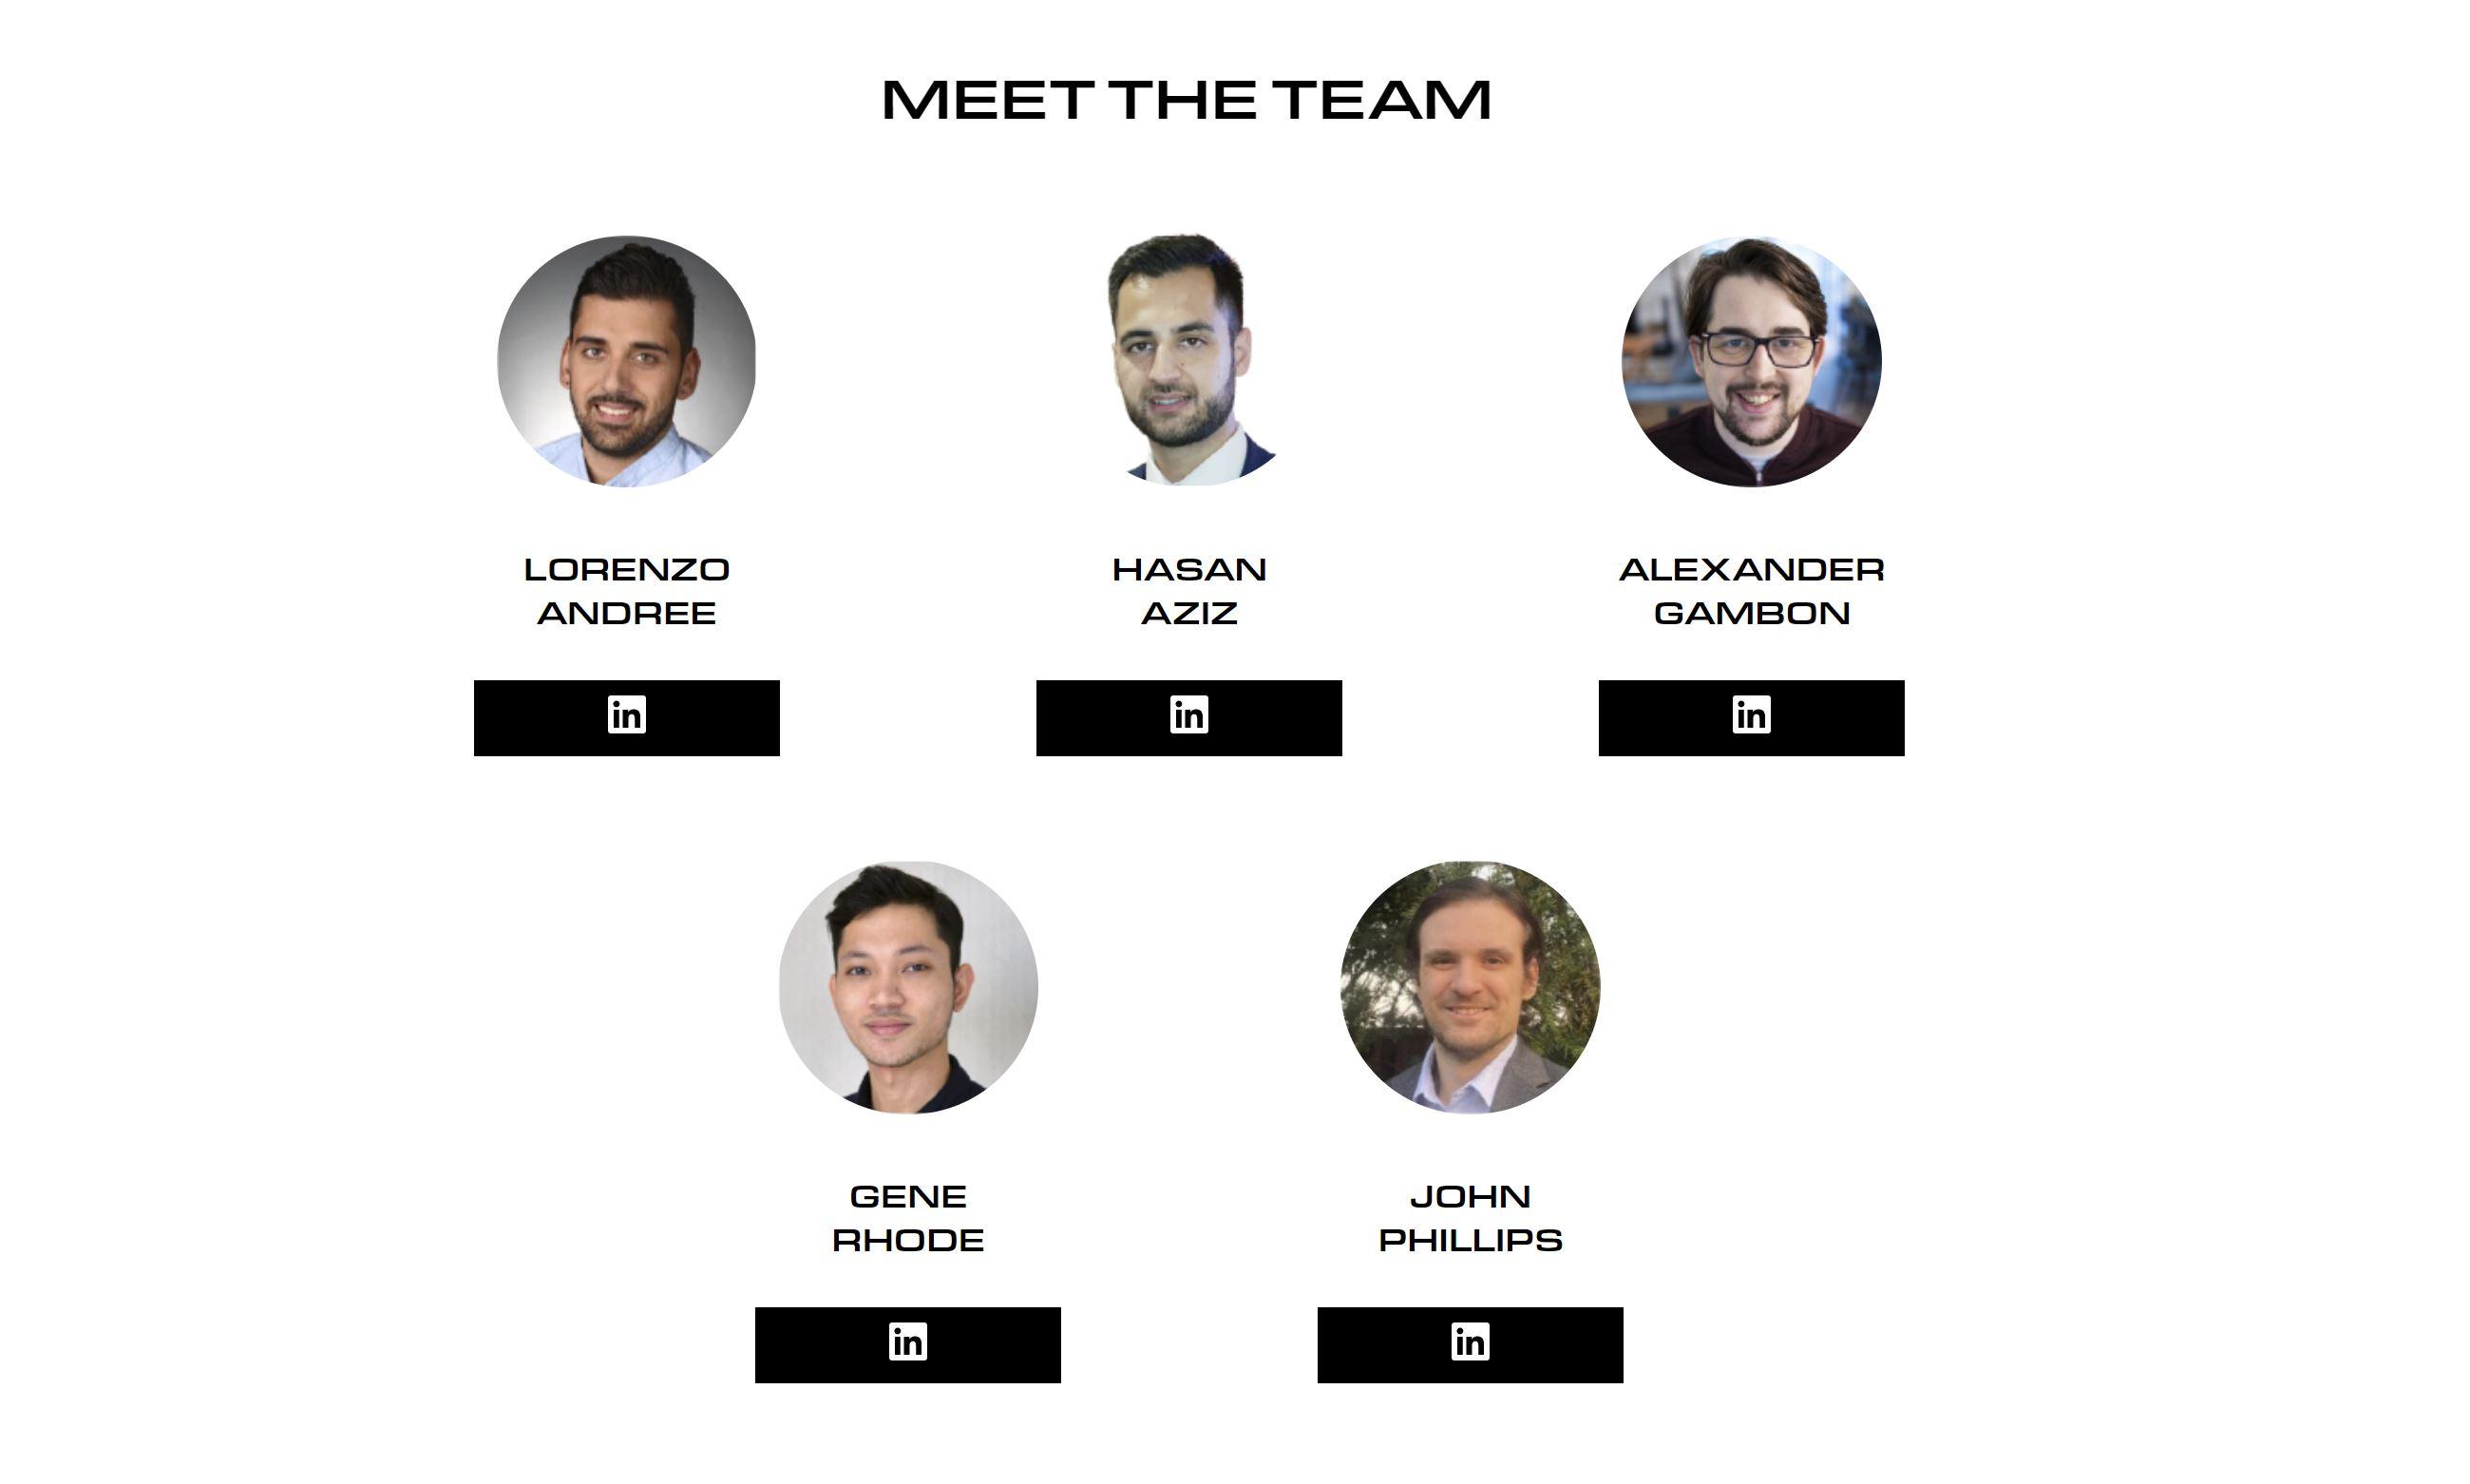 Elongate team